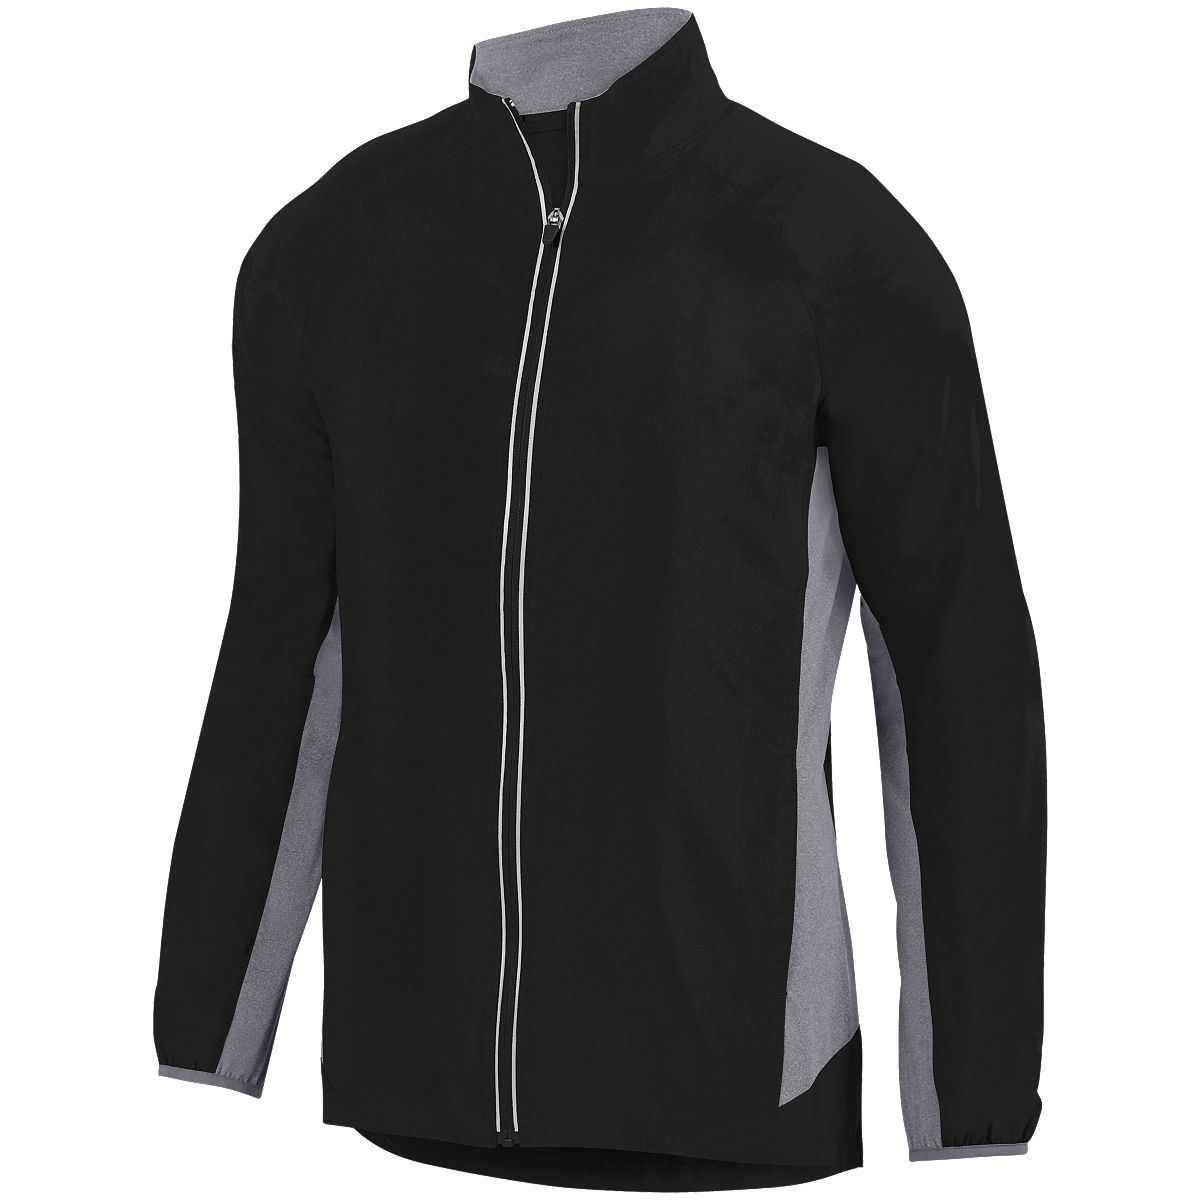 Preeminent Jacket - BLACK/GRAPHITE HEATHER